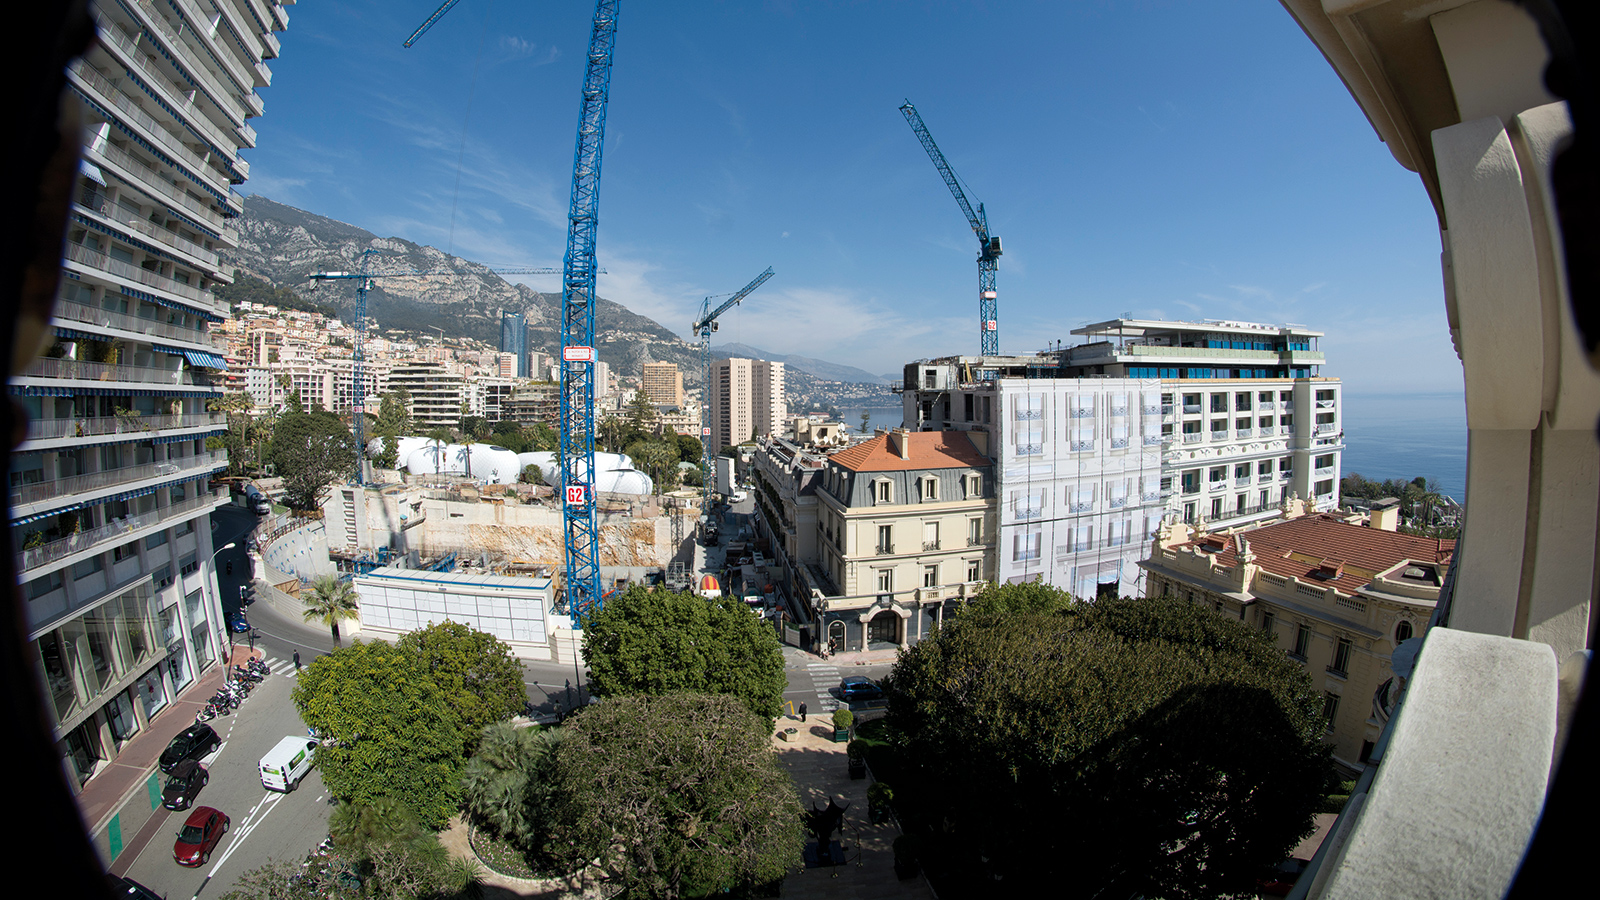 SBM-Chantier-One-Monte-Carlo-et-Hotel-de-Paris-2017-03-15_11-30-00-@-SBM